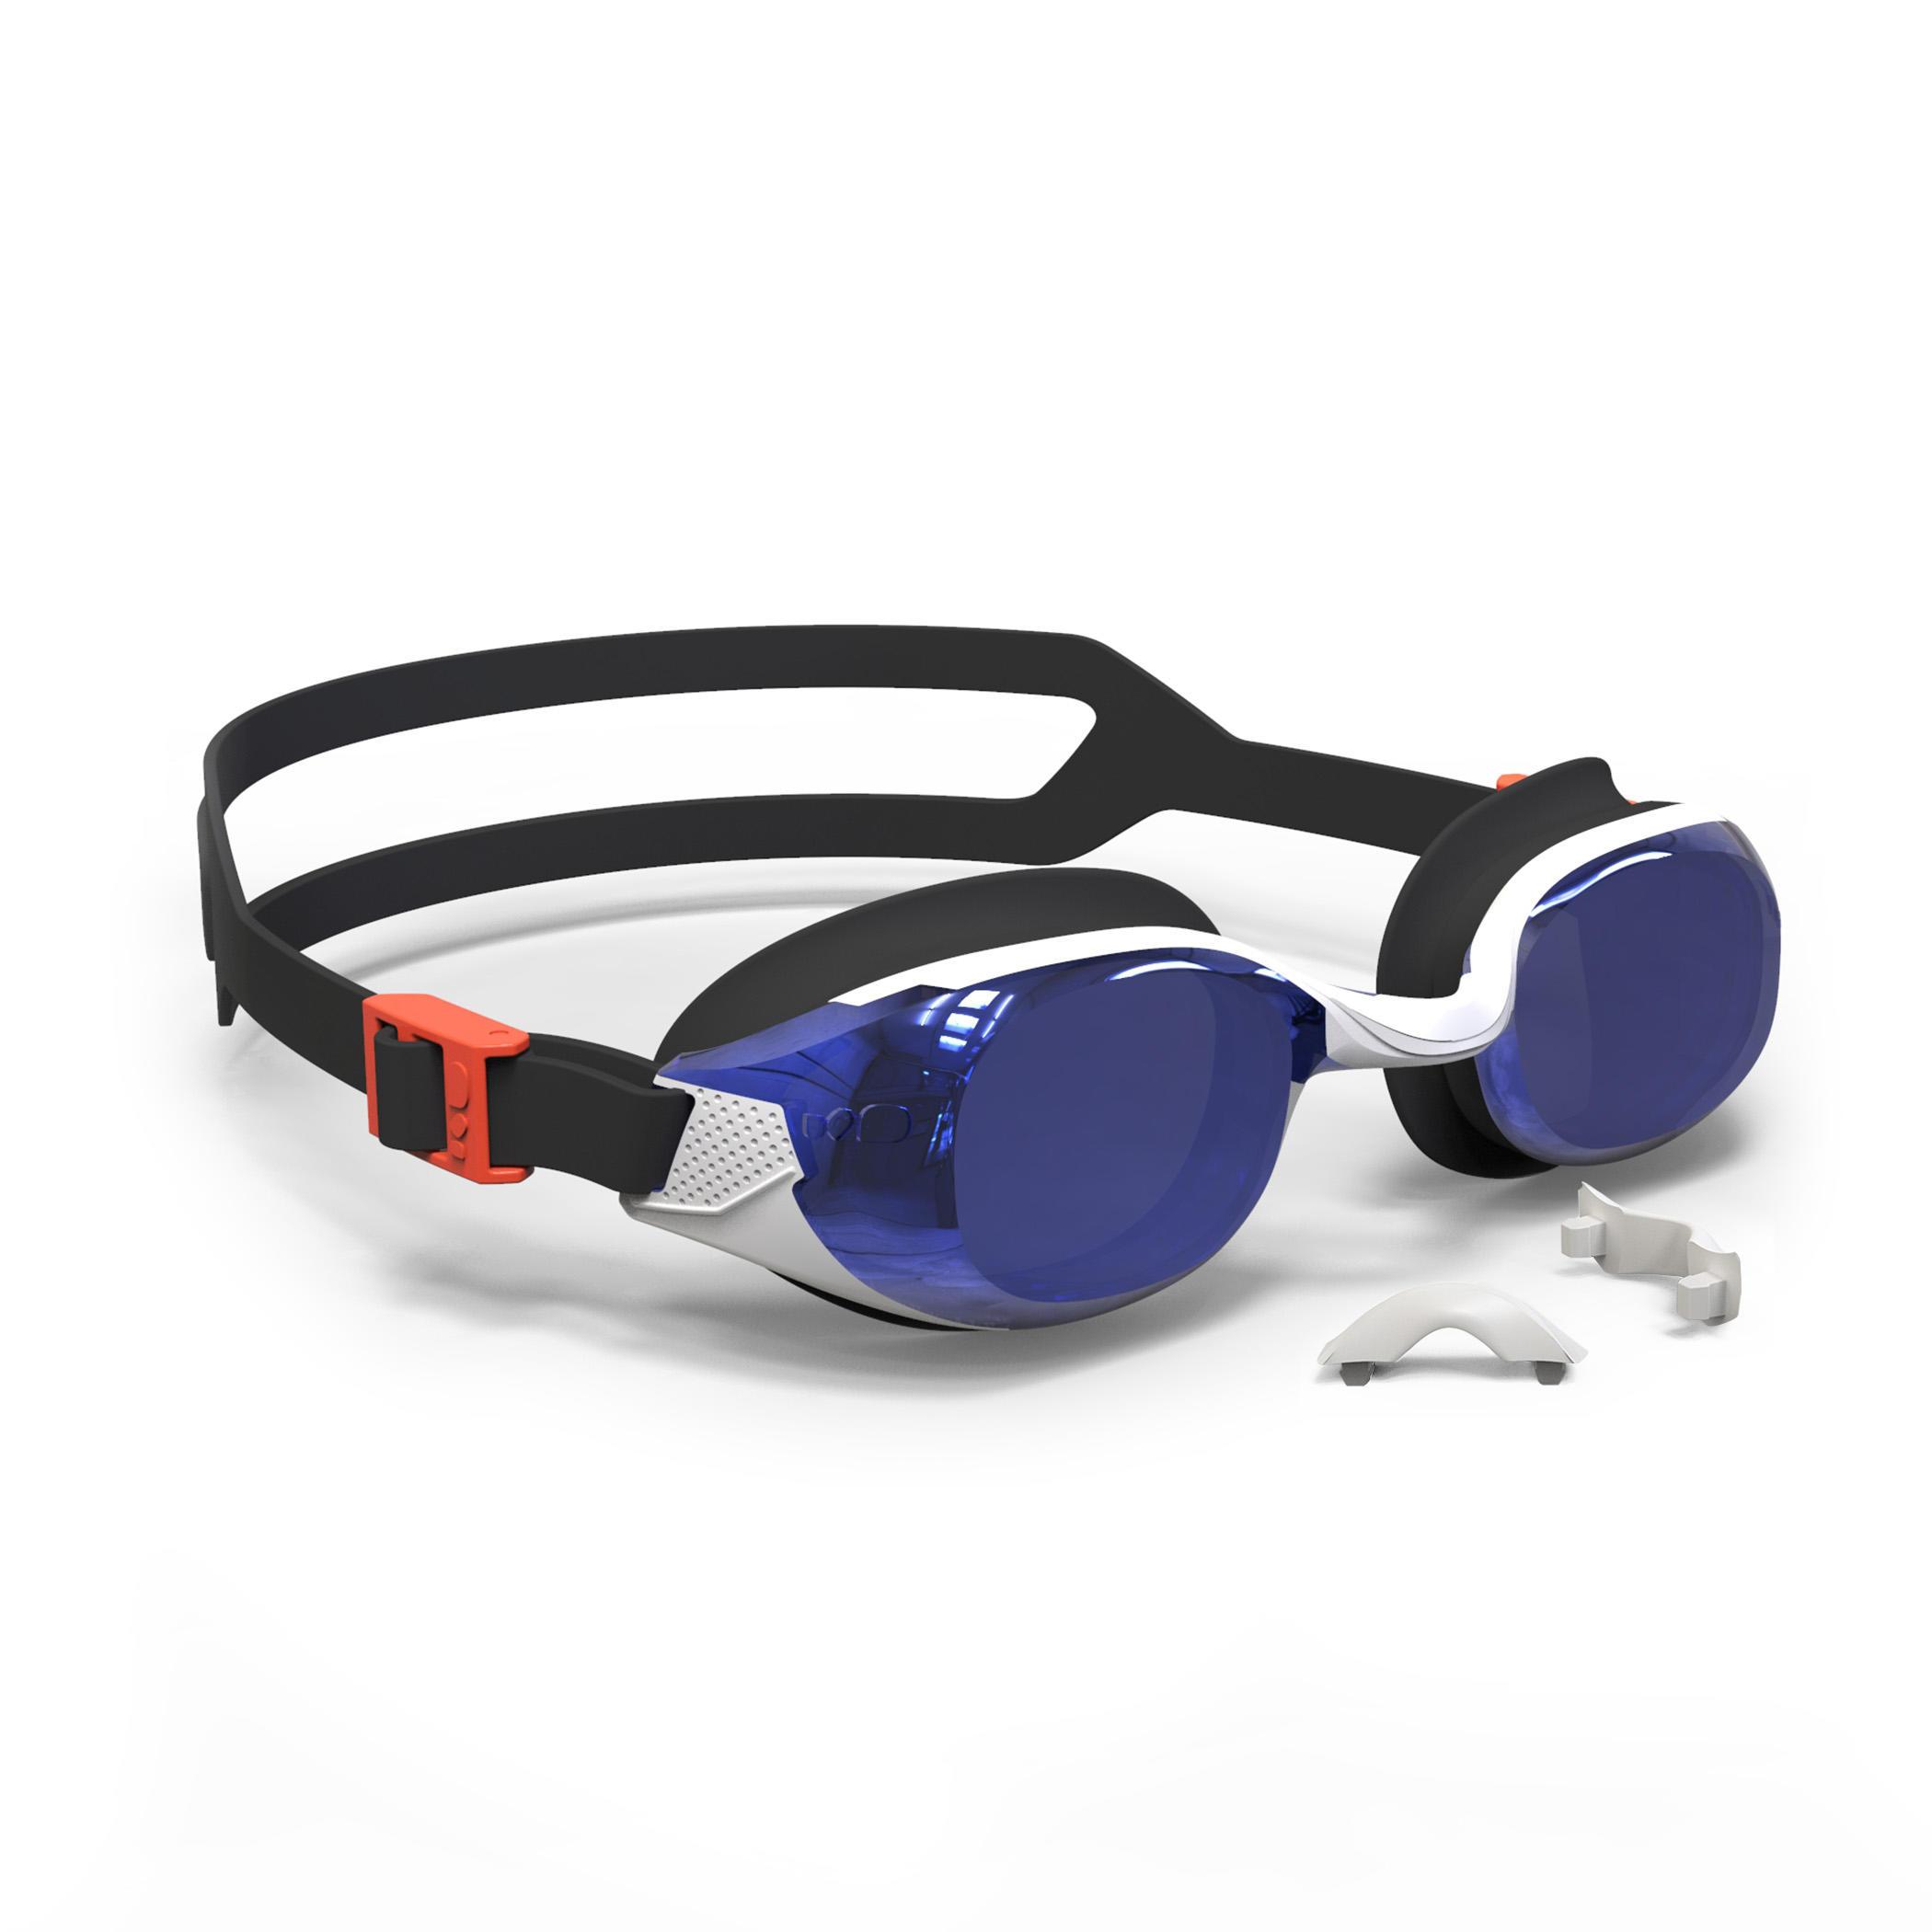 Gafas de natación 500 B-FIT Naranja Azul cristales espejo